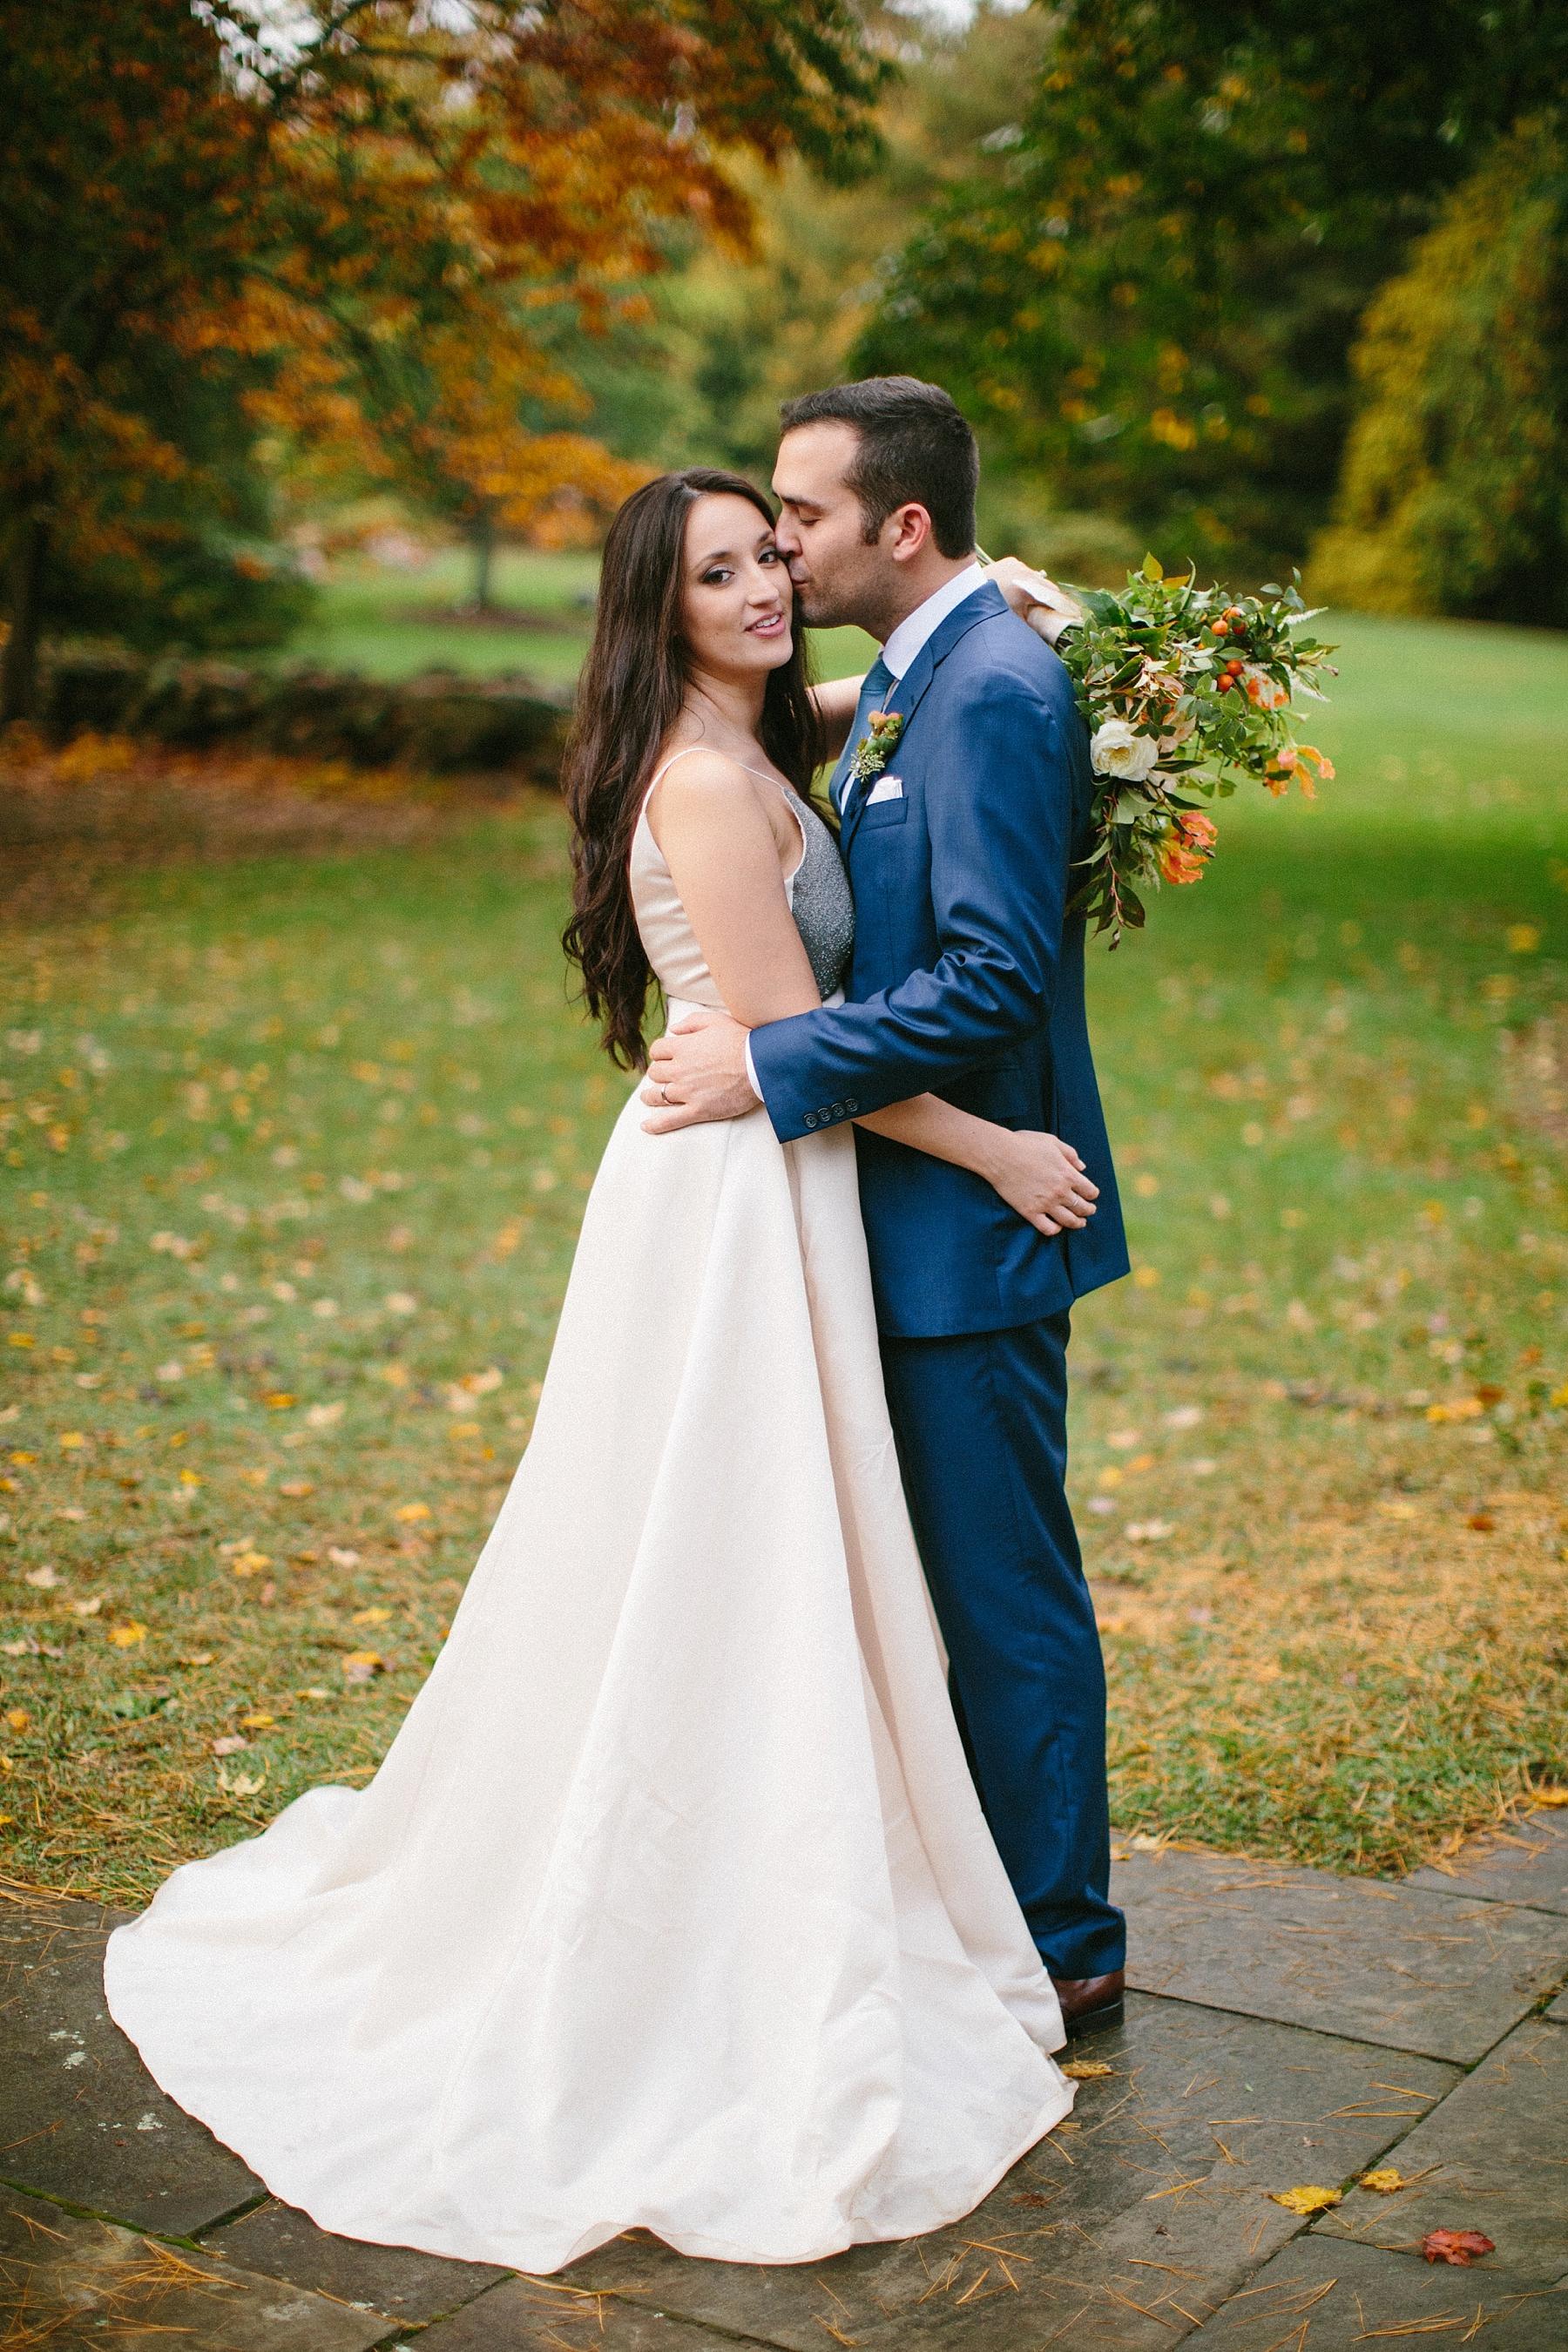 intimate-destination-wedding-photographer-outdoor_0111.jpg